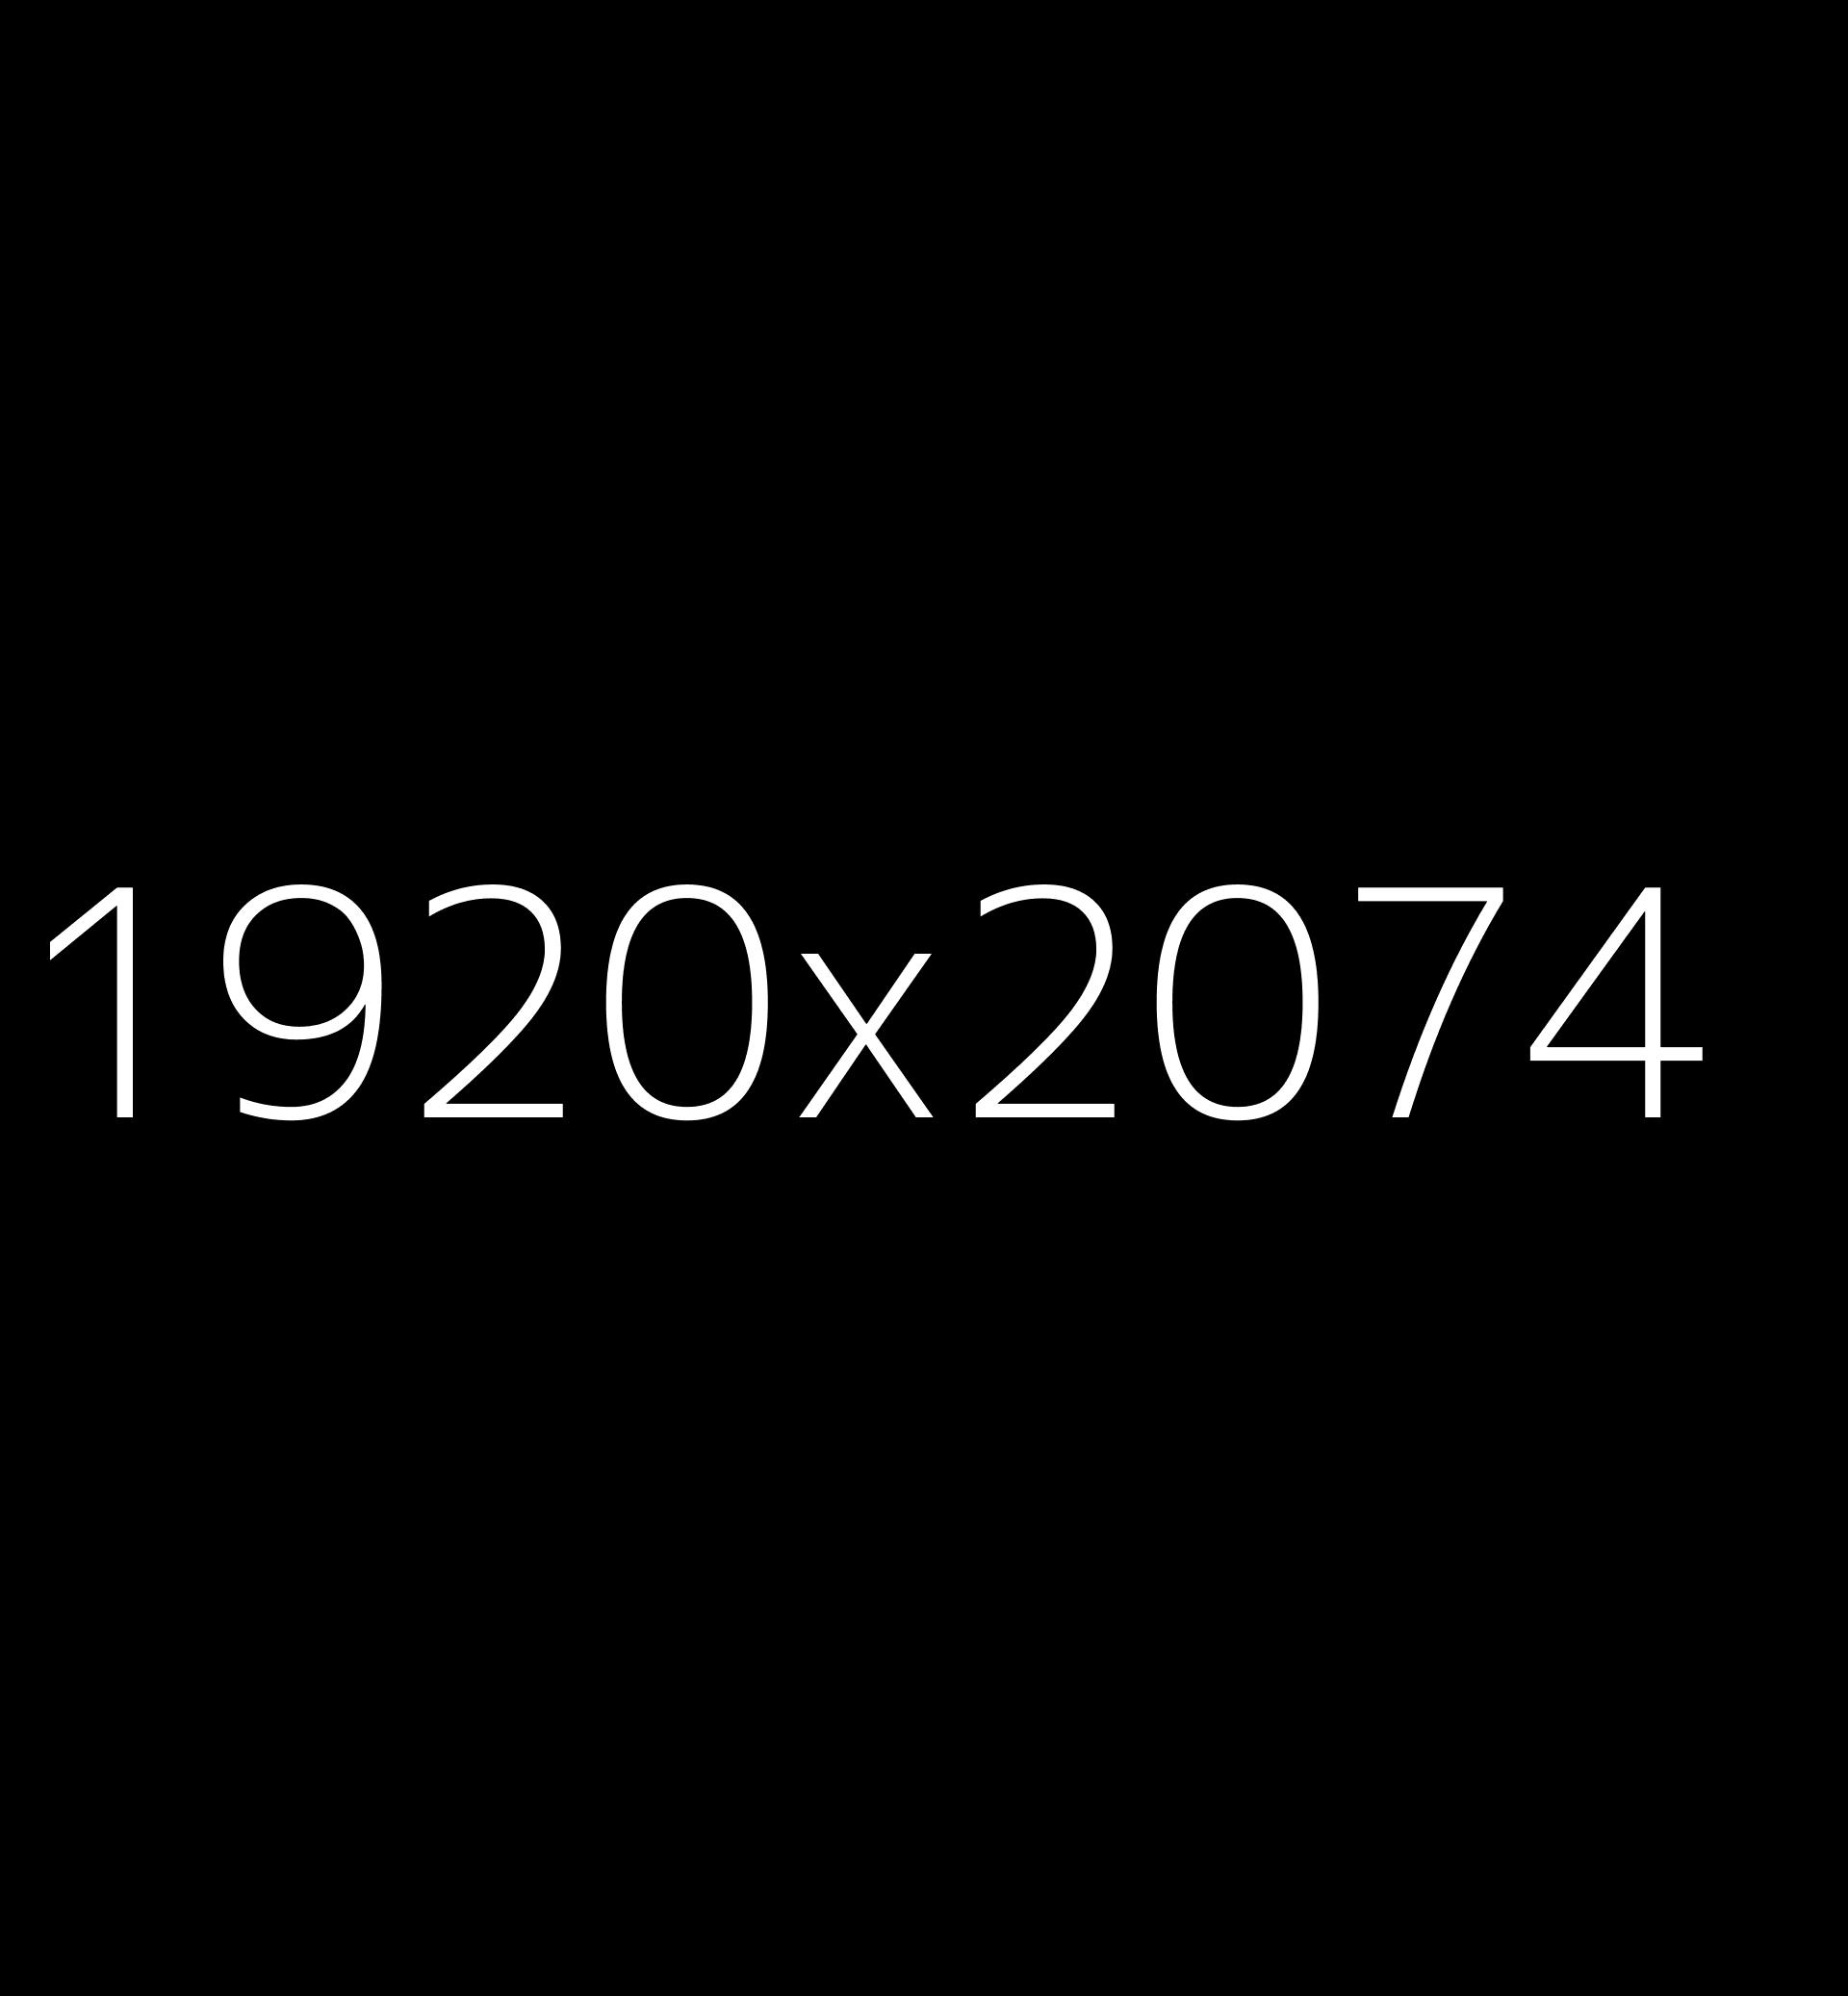 1920x2074